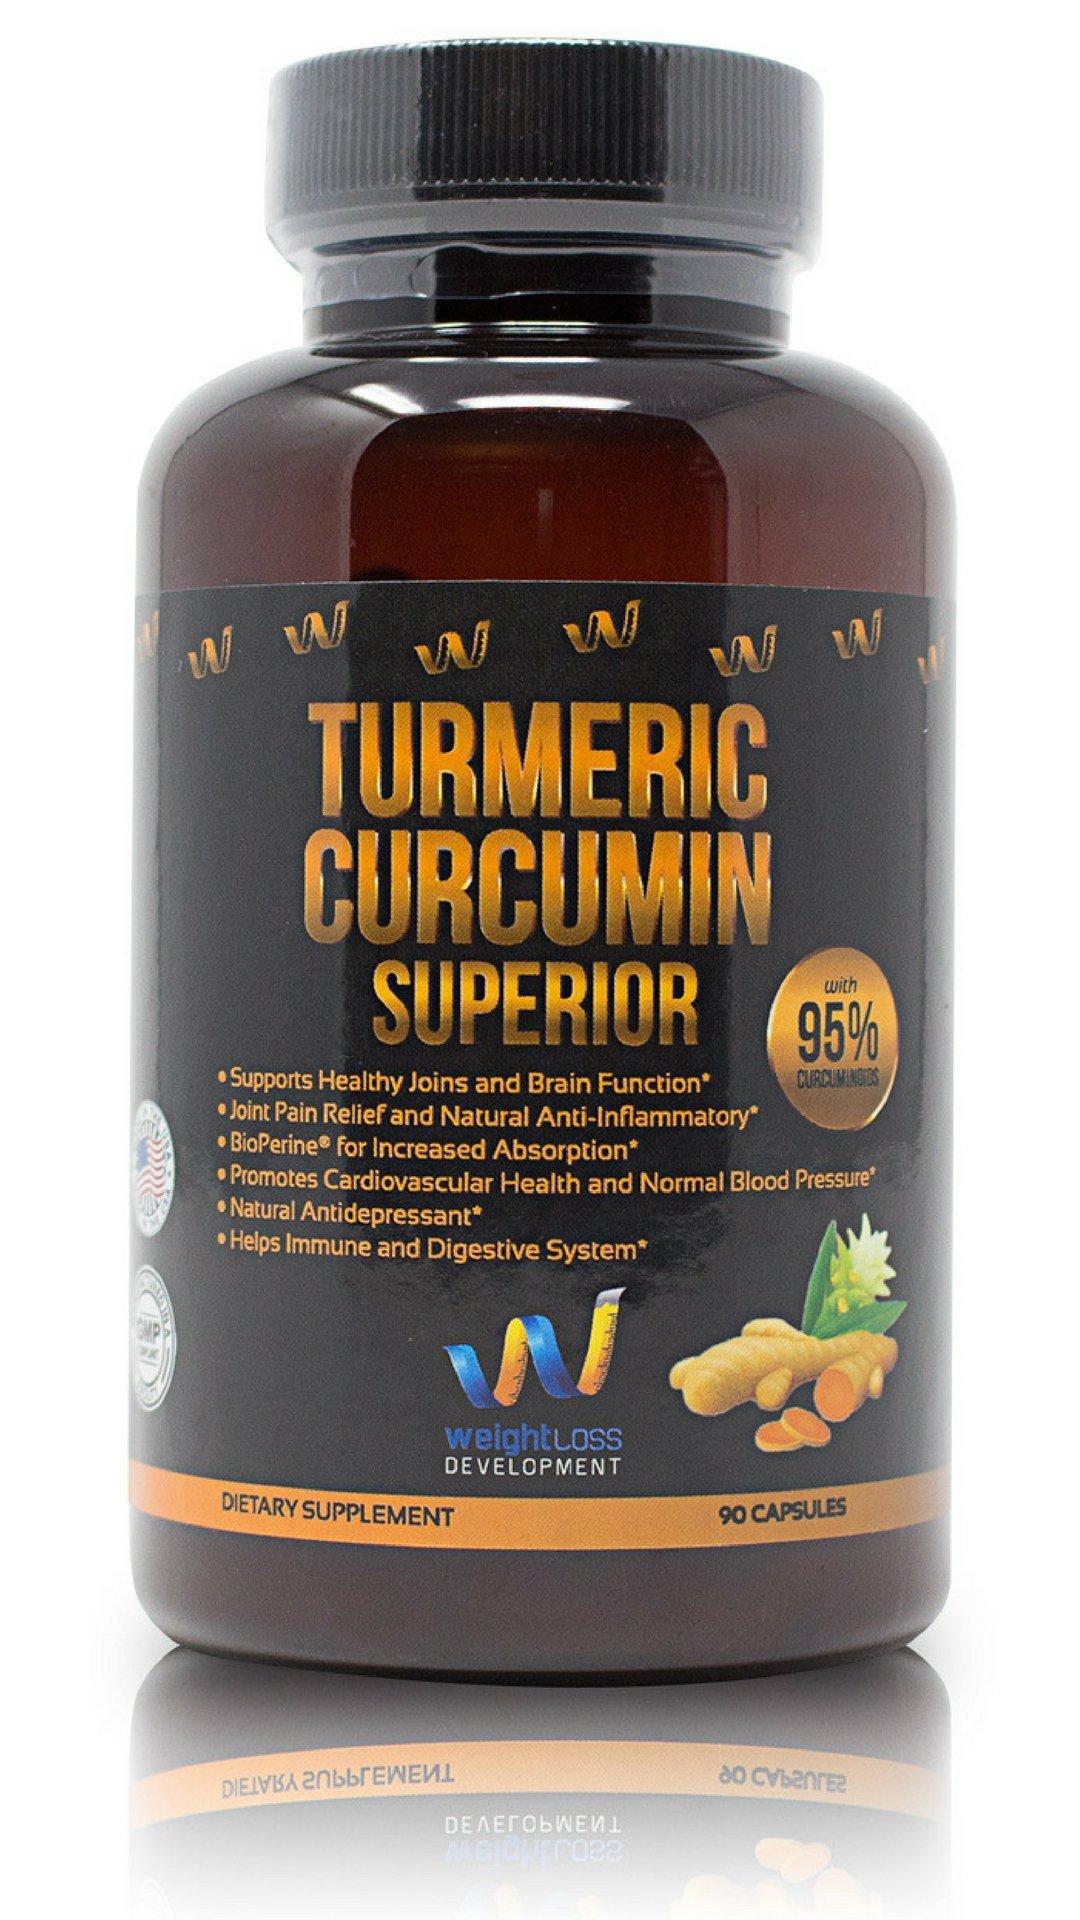 Turmeric Curcumin Supplement Capsules - 95% Curcuminoids & BioPerine Black Pepper Extract 1300 mg - Advanced Absorption, Anti-Inflammatory, Weight Loss, Cardiovascular & Joint Support - 90 Pills by Weight Loss Development Inc.